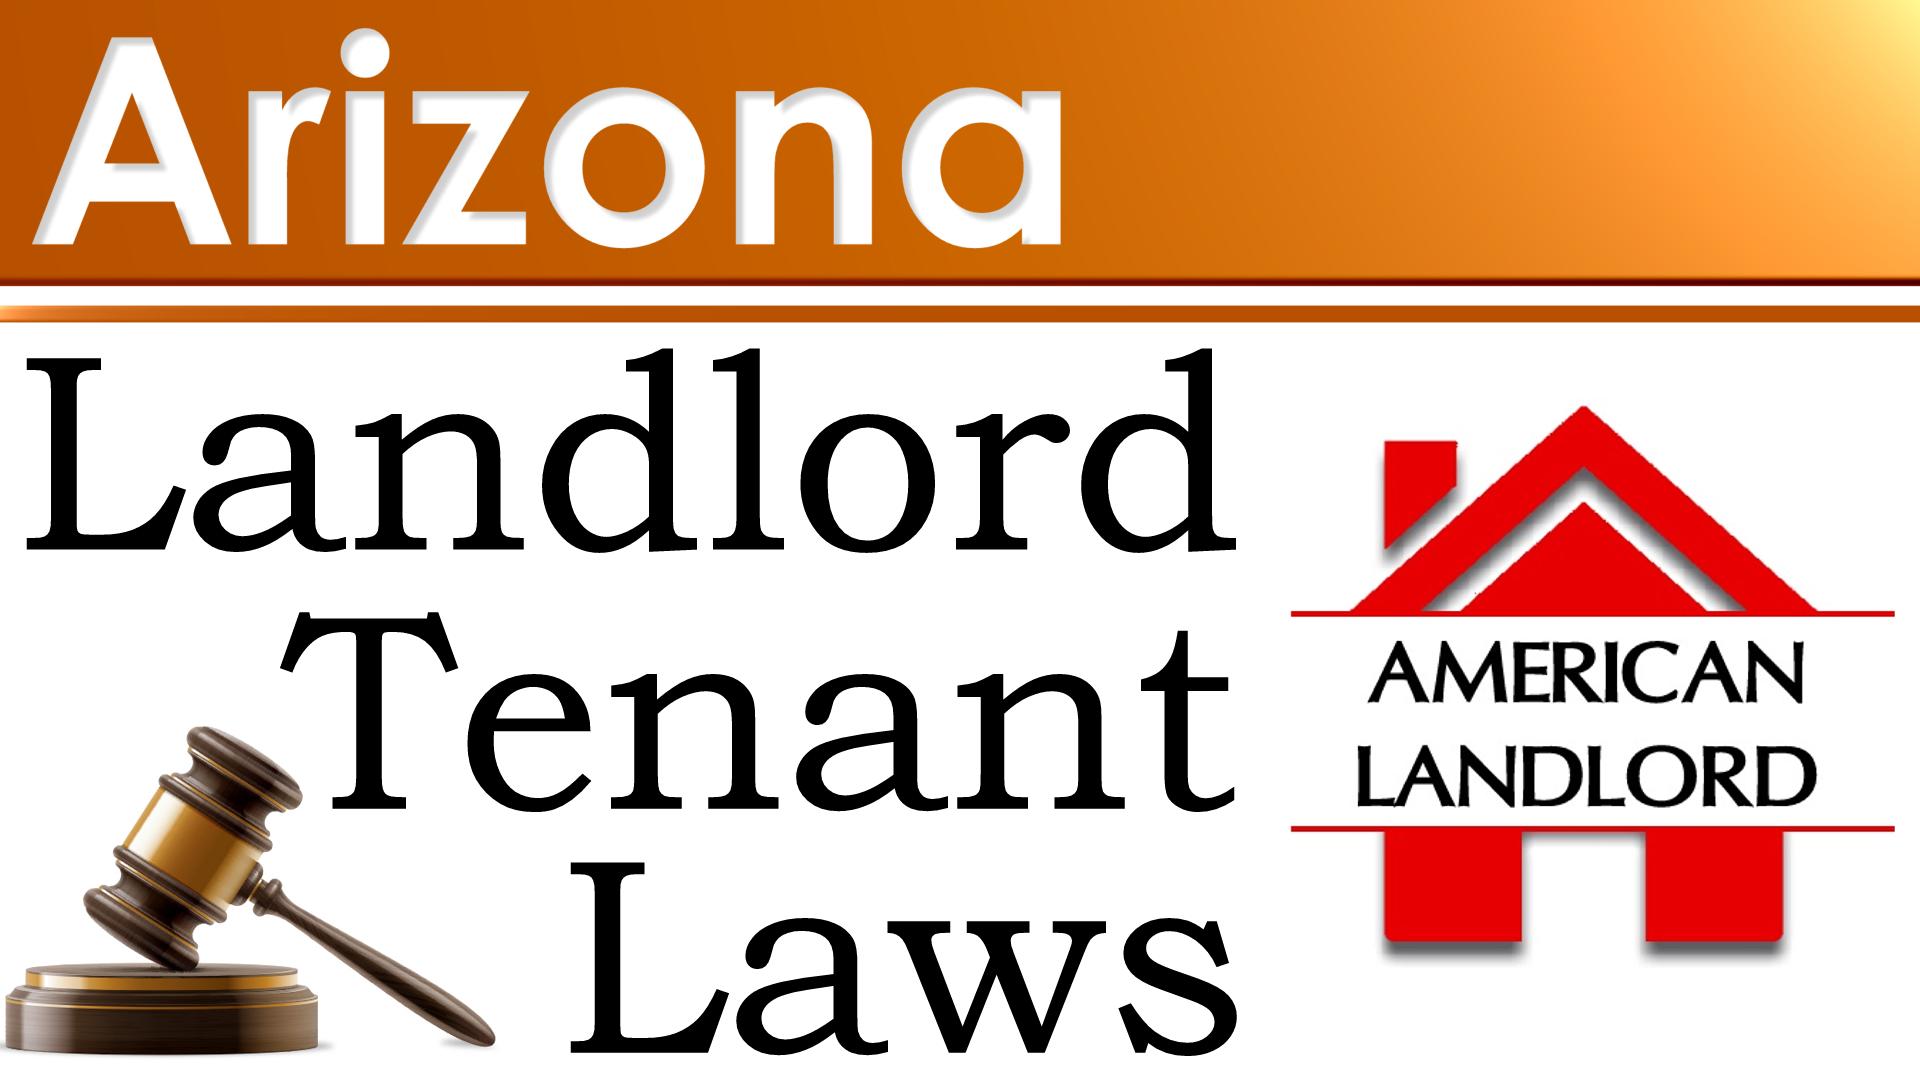 Arizona Landlord-Tenant Laws - American Landlord